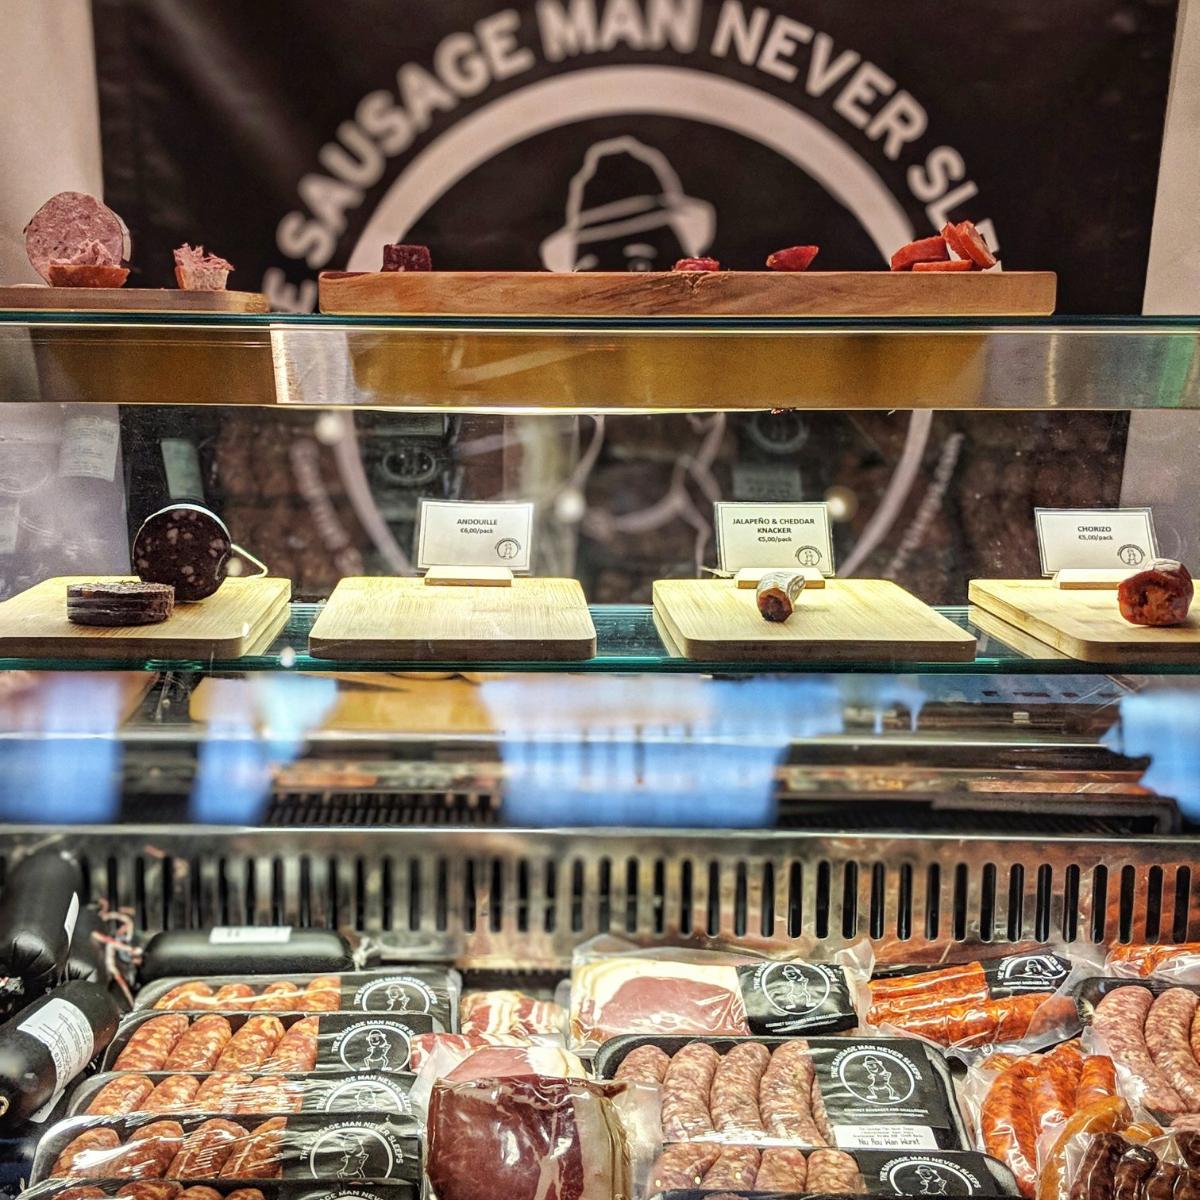 The Sausage Man never sleeps Berlin